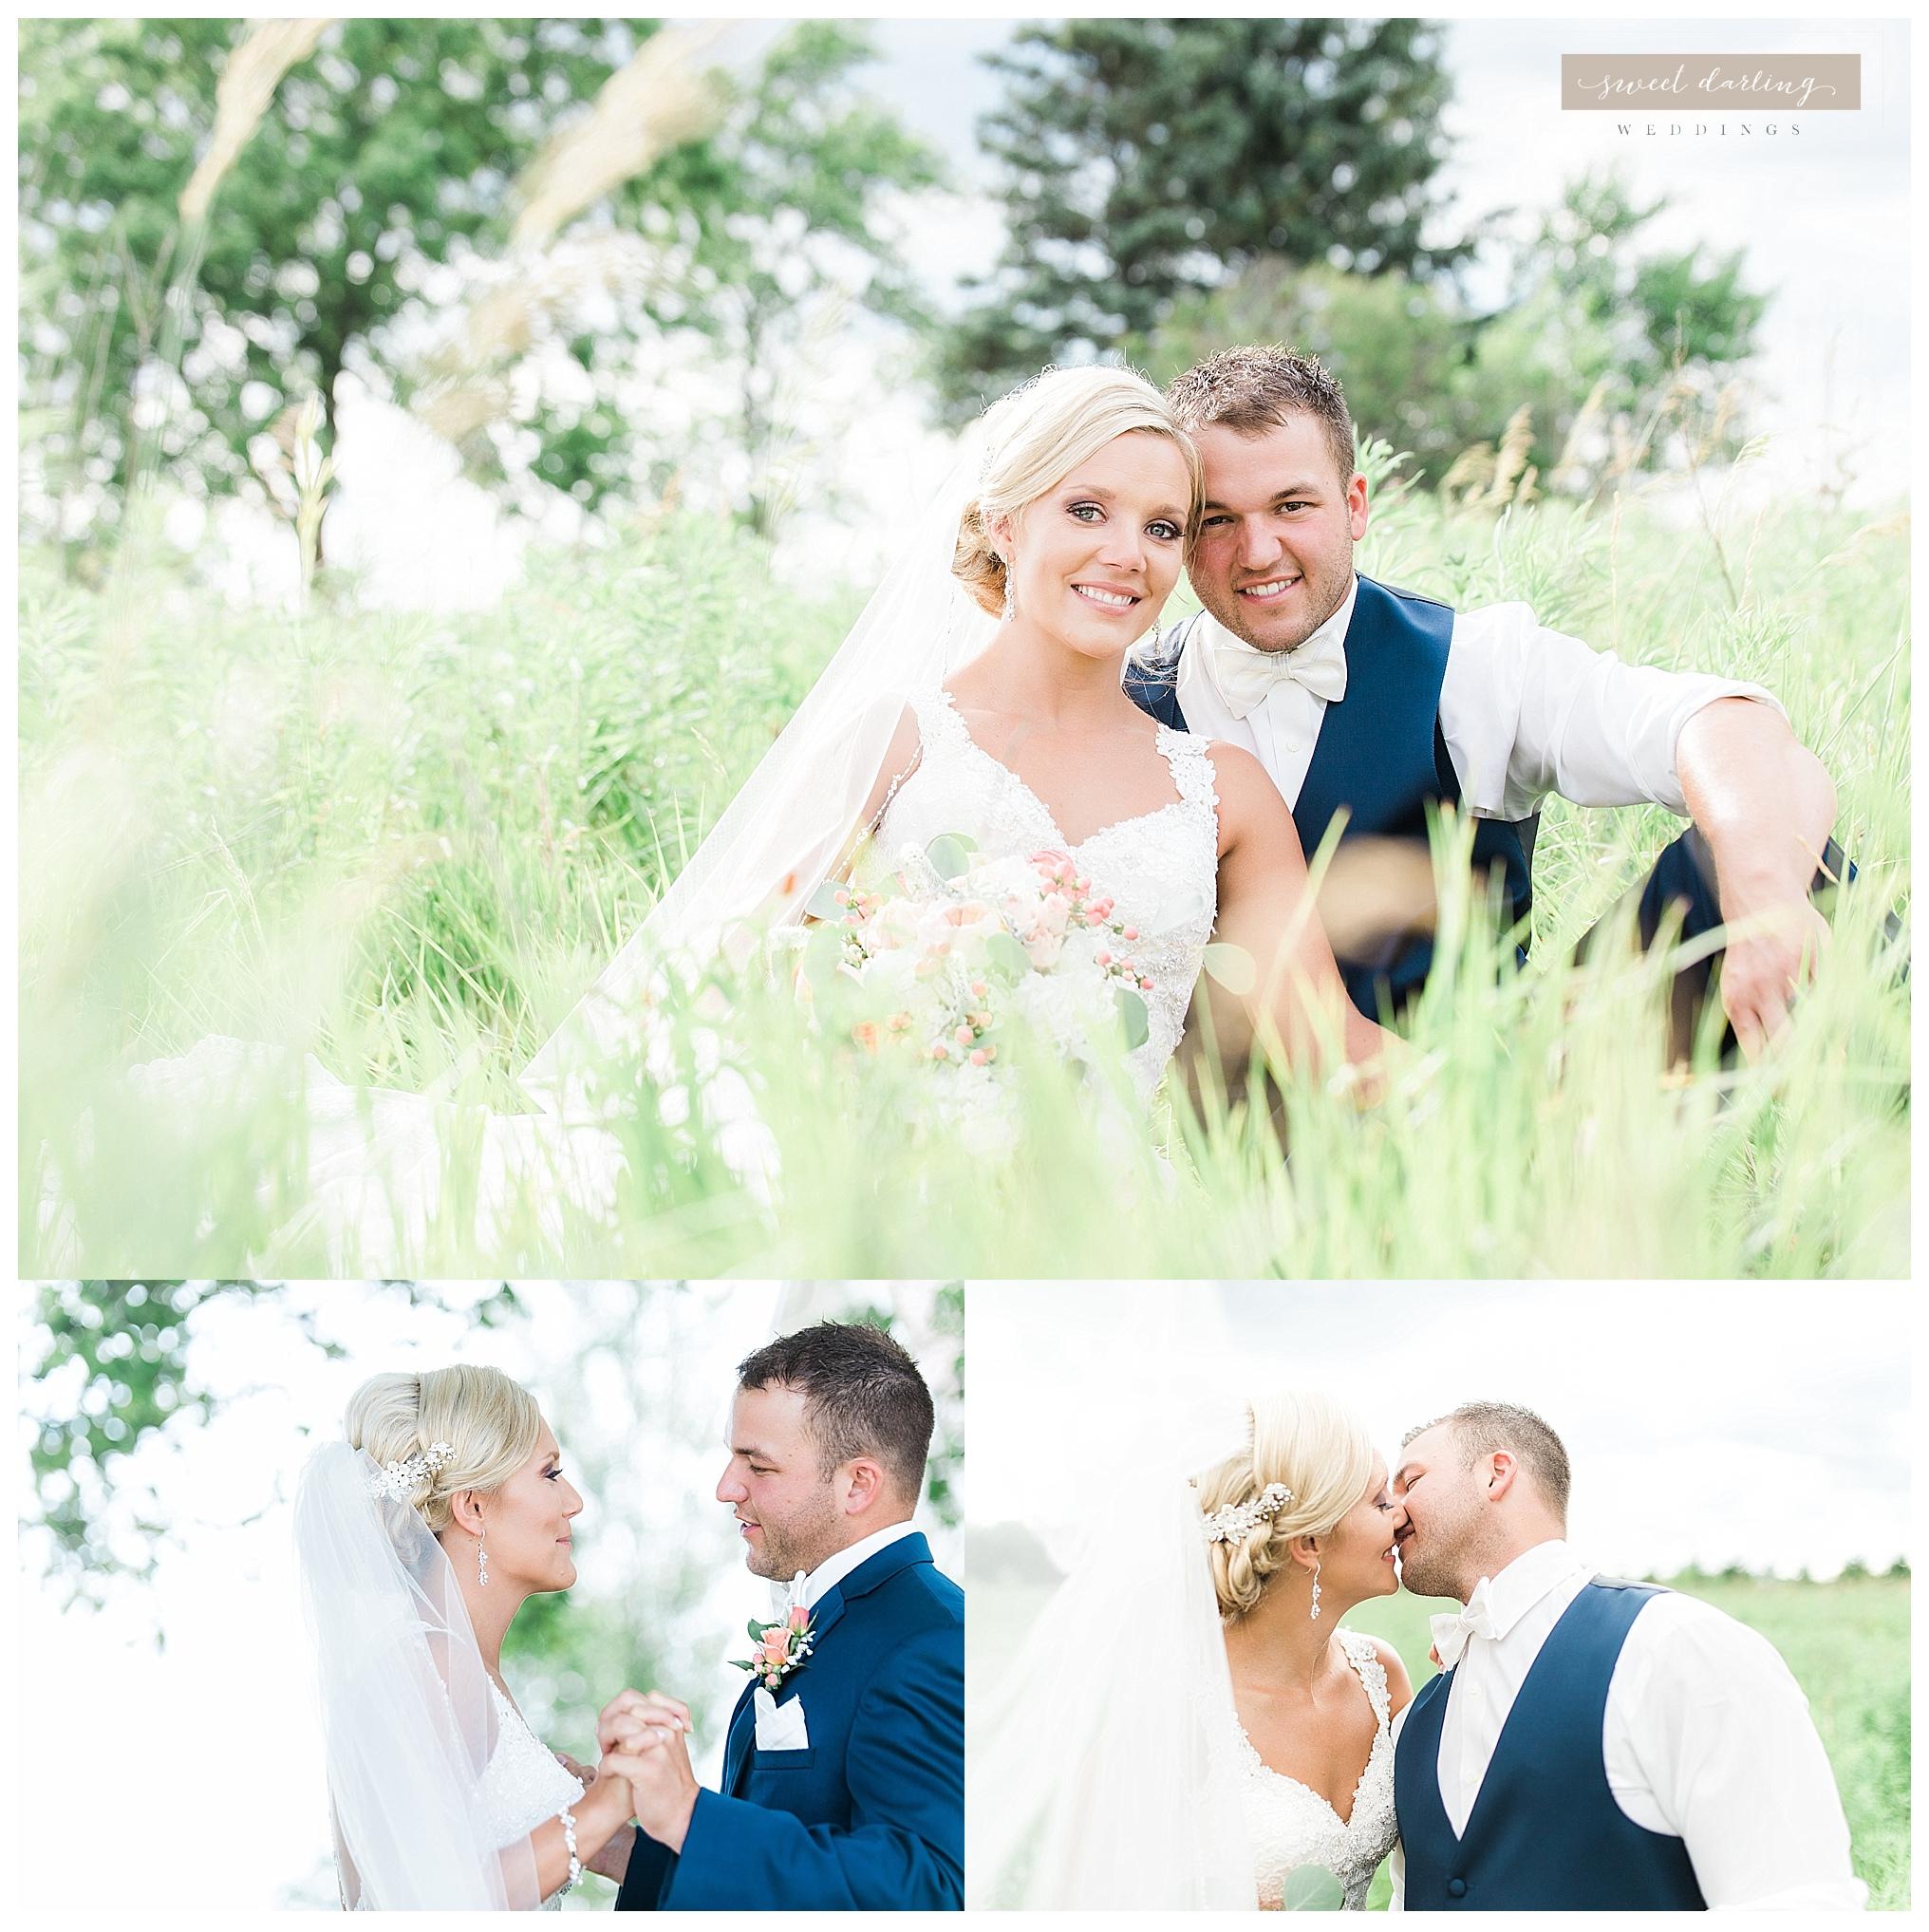 Paxton-illinois-engelbrecht-farmstead-romantic-wedding-photographer-sweet-darling-weddings_1246.jpg